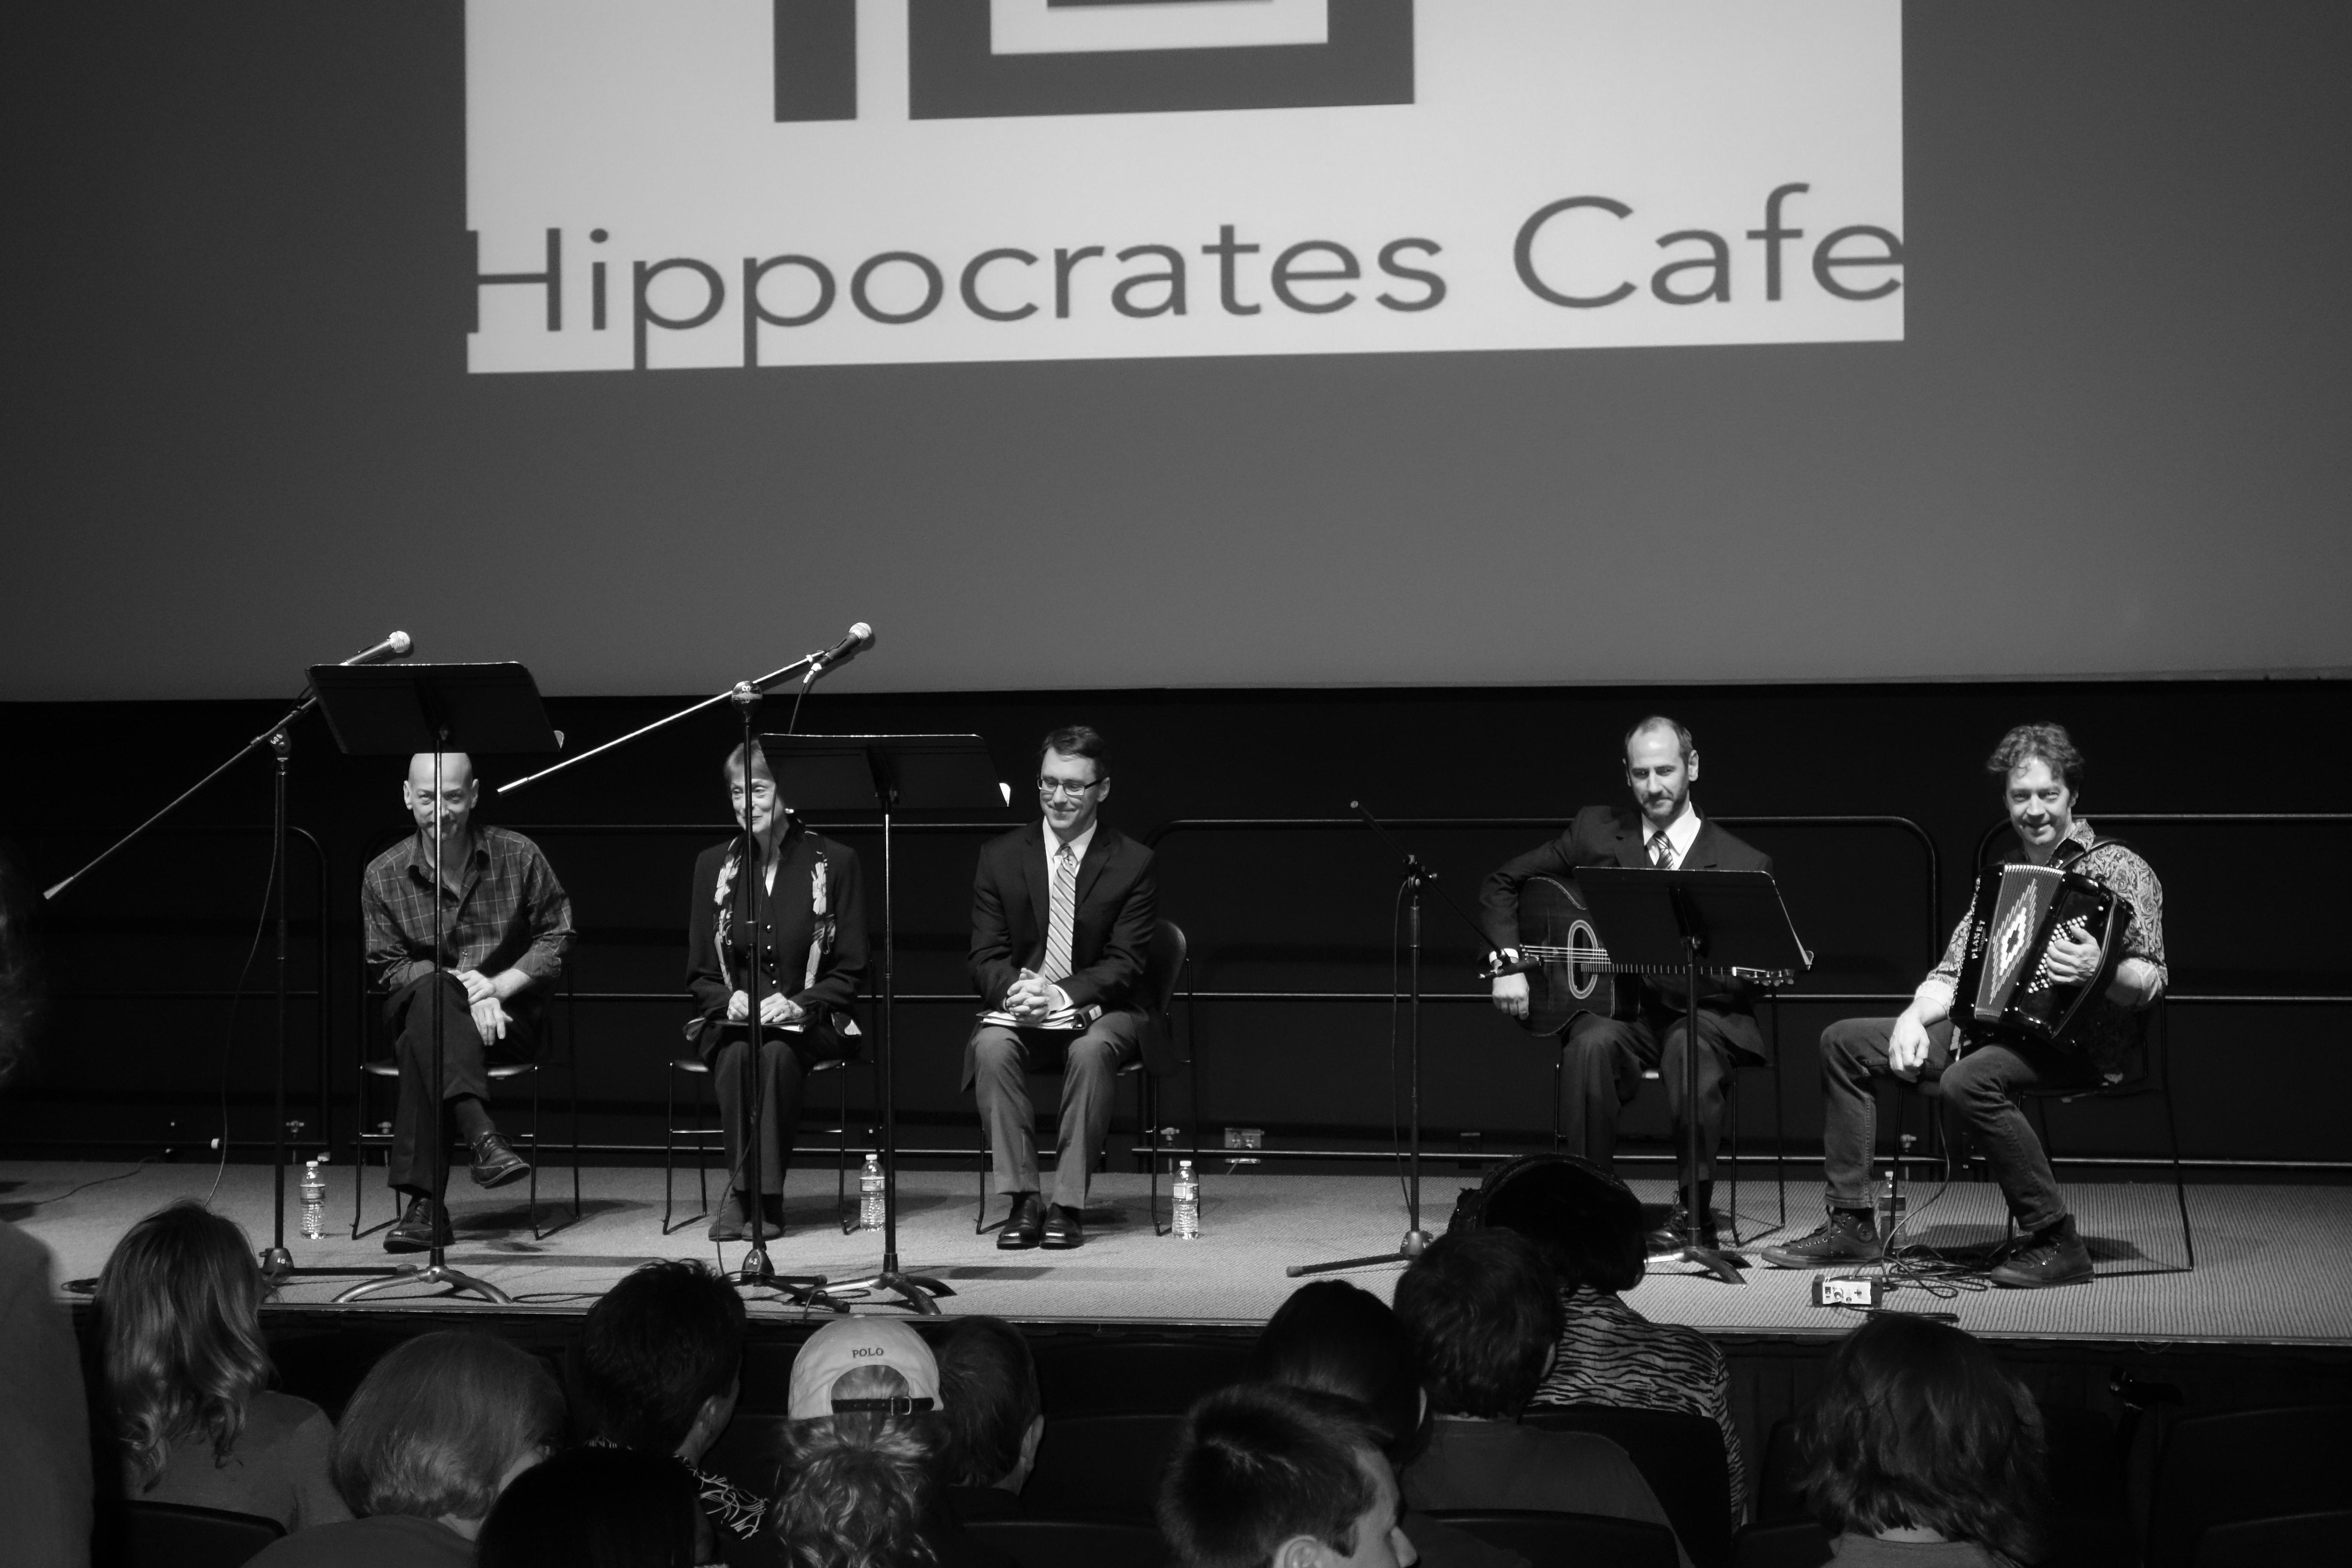 Caption: L to R: Matthew Sciple, Katherine Ferrand, Jon Hallberg, Robert Bell, and Dan Newton